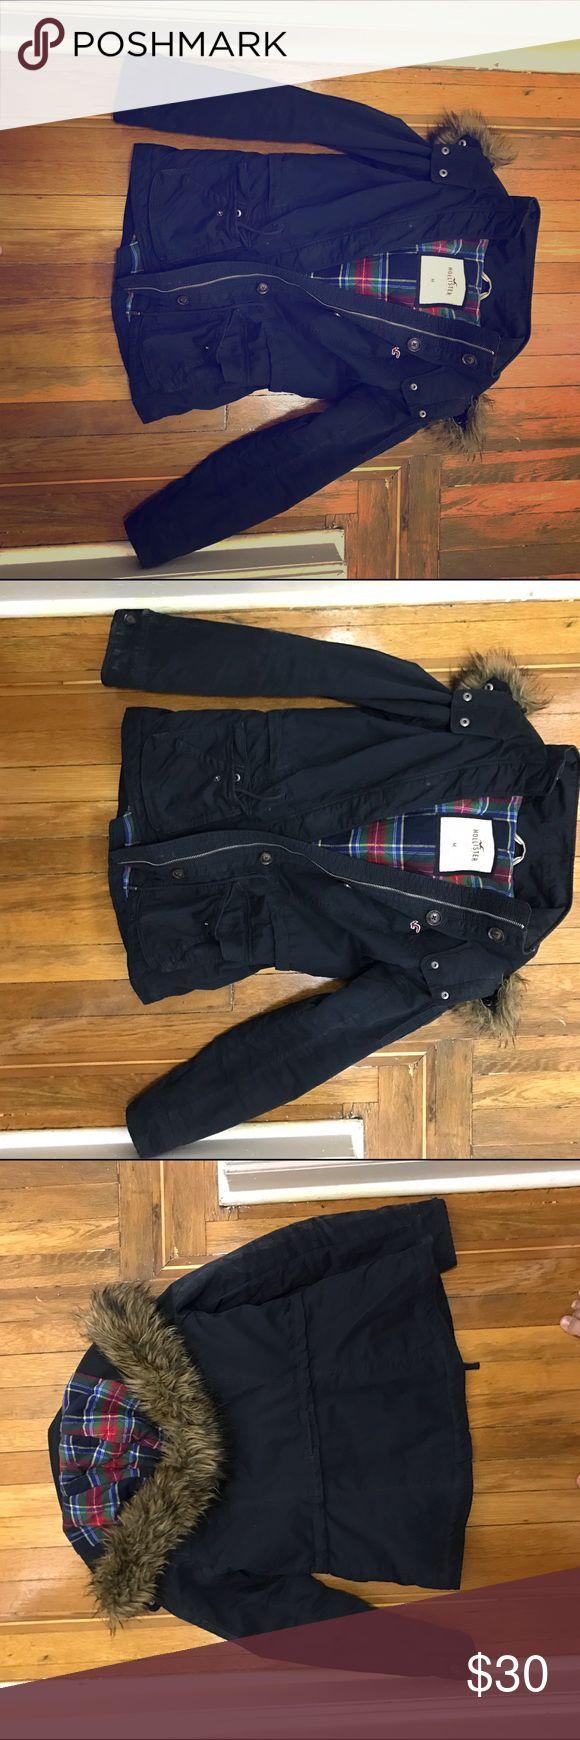 Dark Navy Blue Hollister Coat Gently worn warm Hollister coat! Needs to be washed! Hollister Jackets & Coats